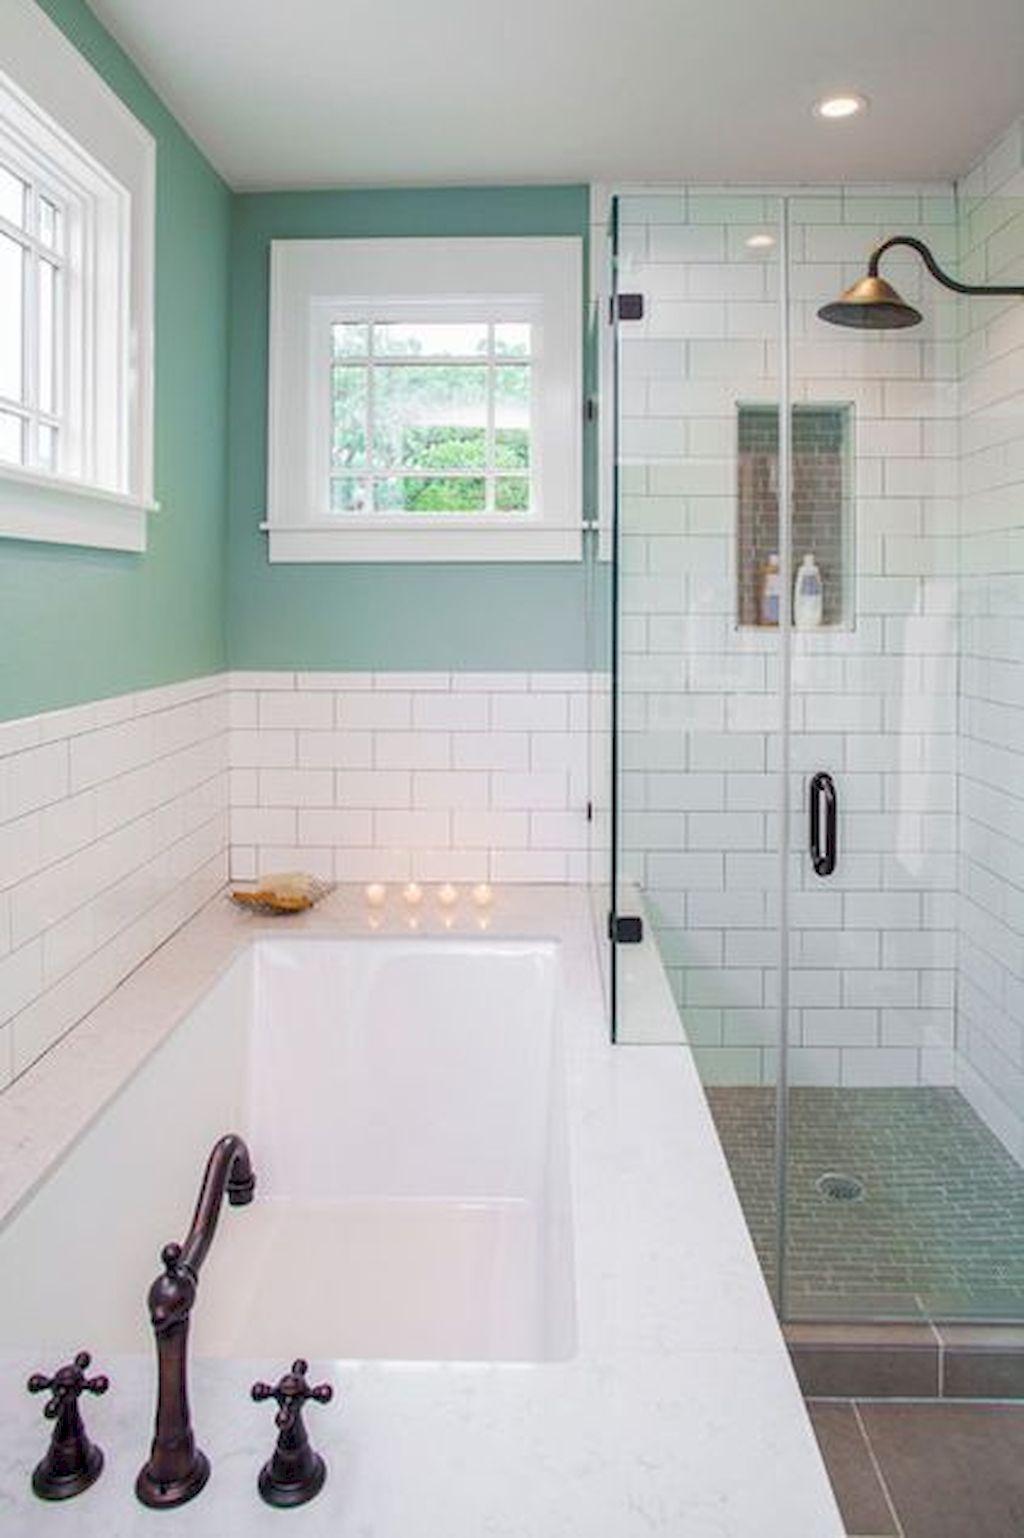 75 Cool Small Master Bathroom Renovation Ideas | Long ...